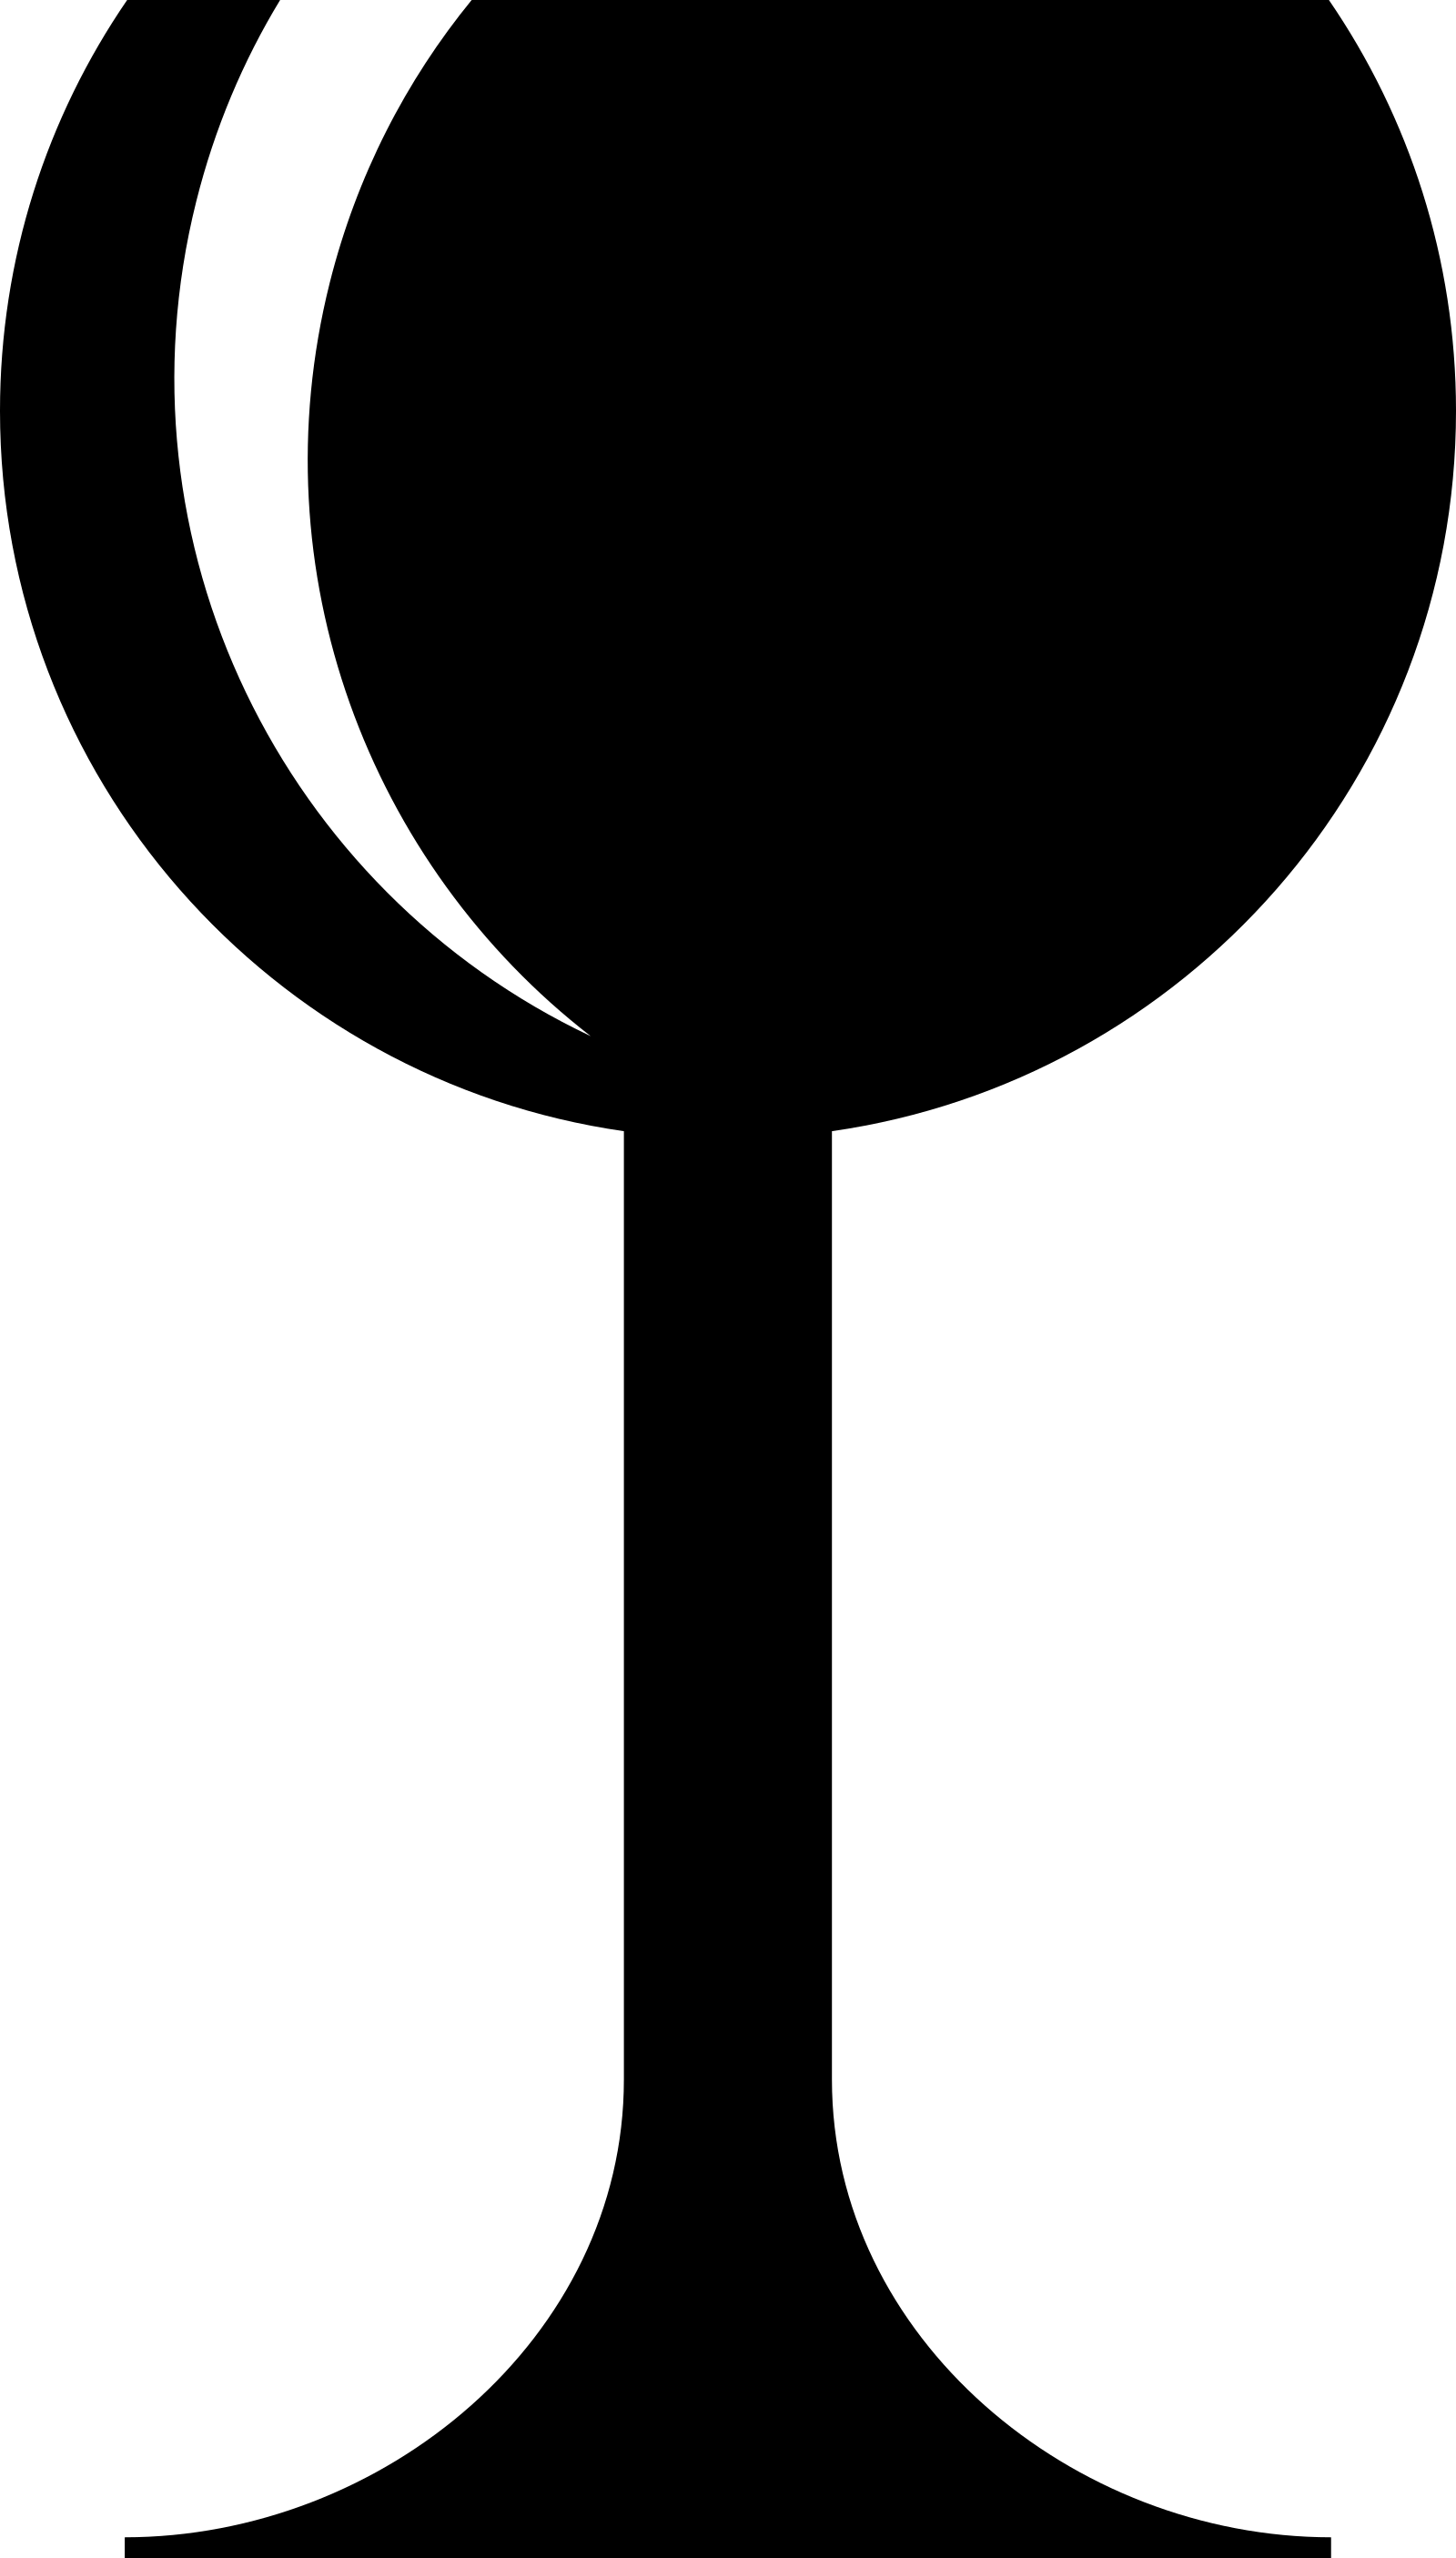 Vine 3 SVG Clip arts